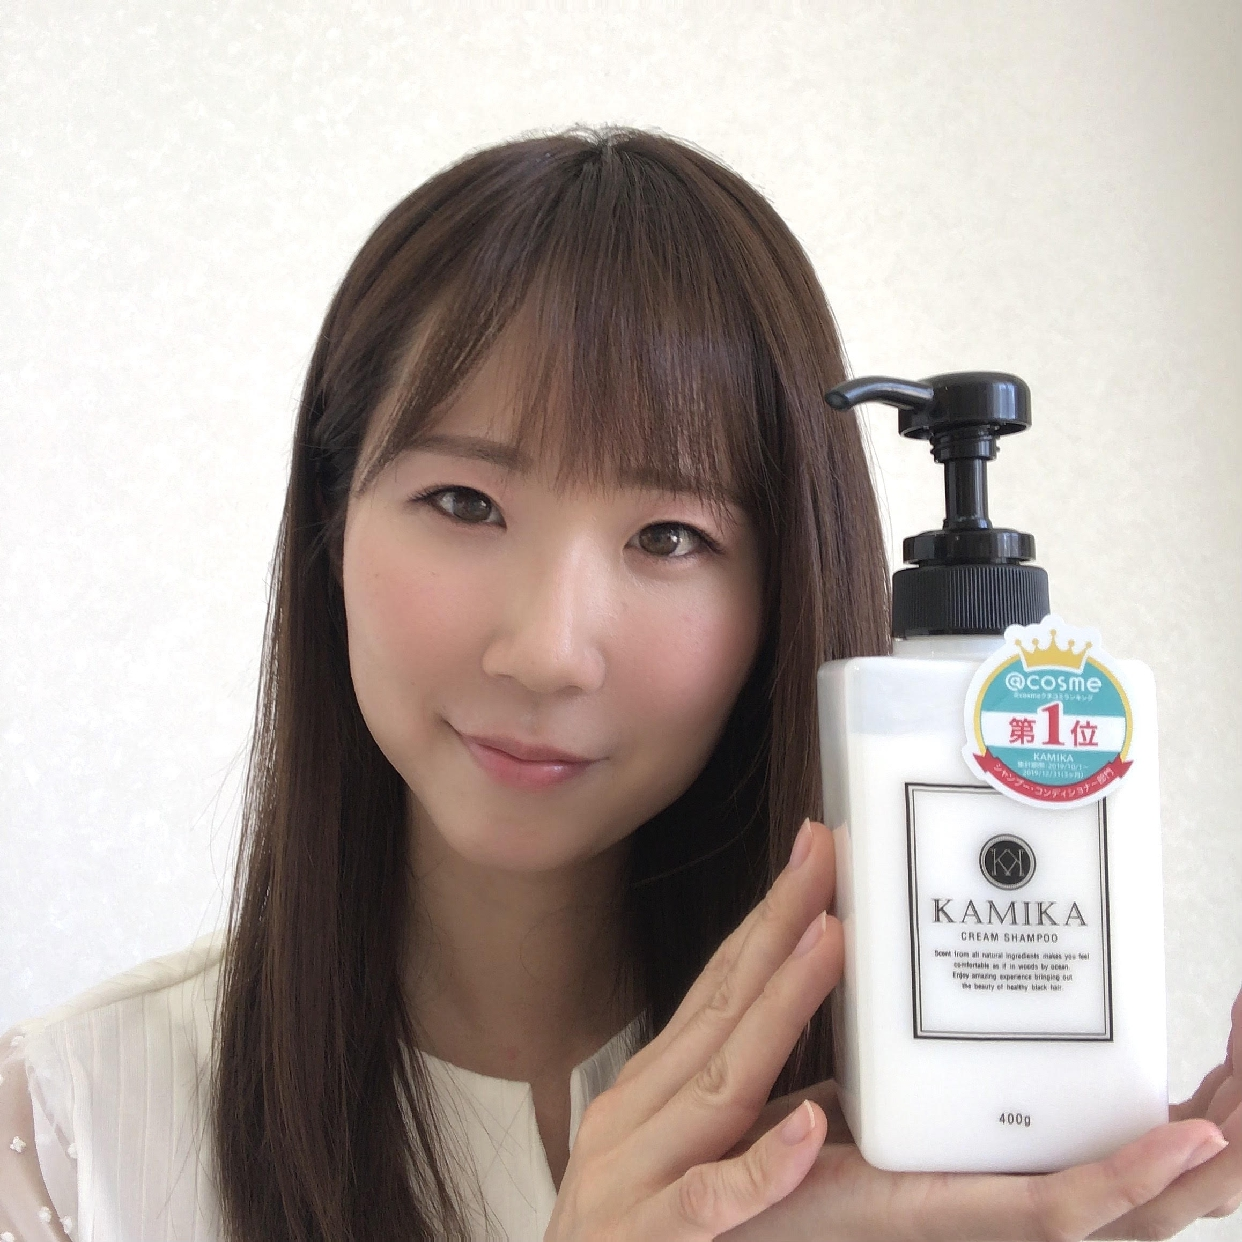 KAMIKA(カミカ) オールインワン黒髪クリームシャンプーを使った上田 麻里さんのクチコミ画像1